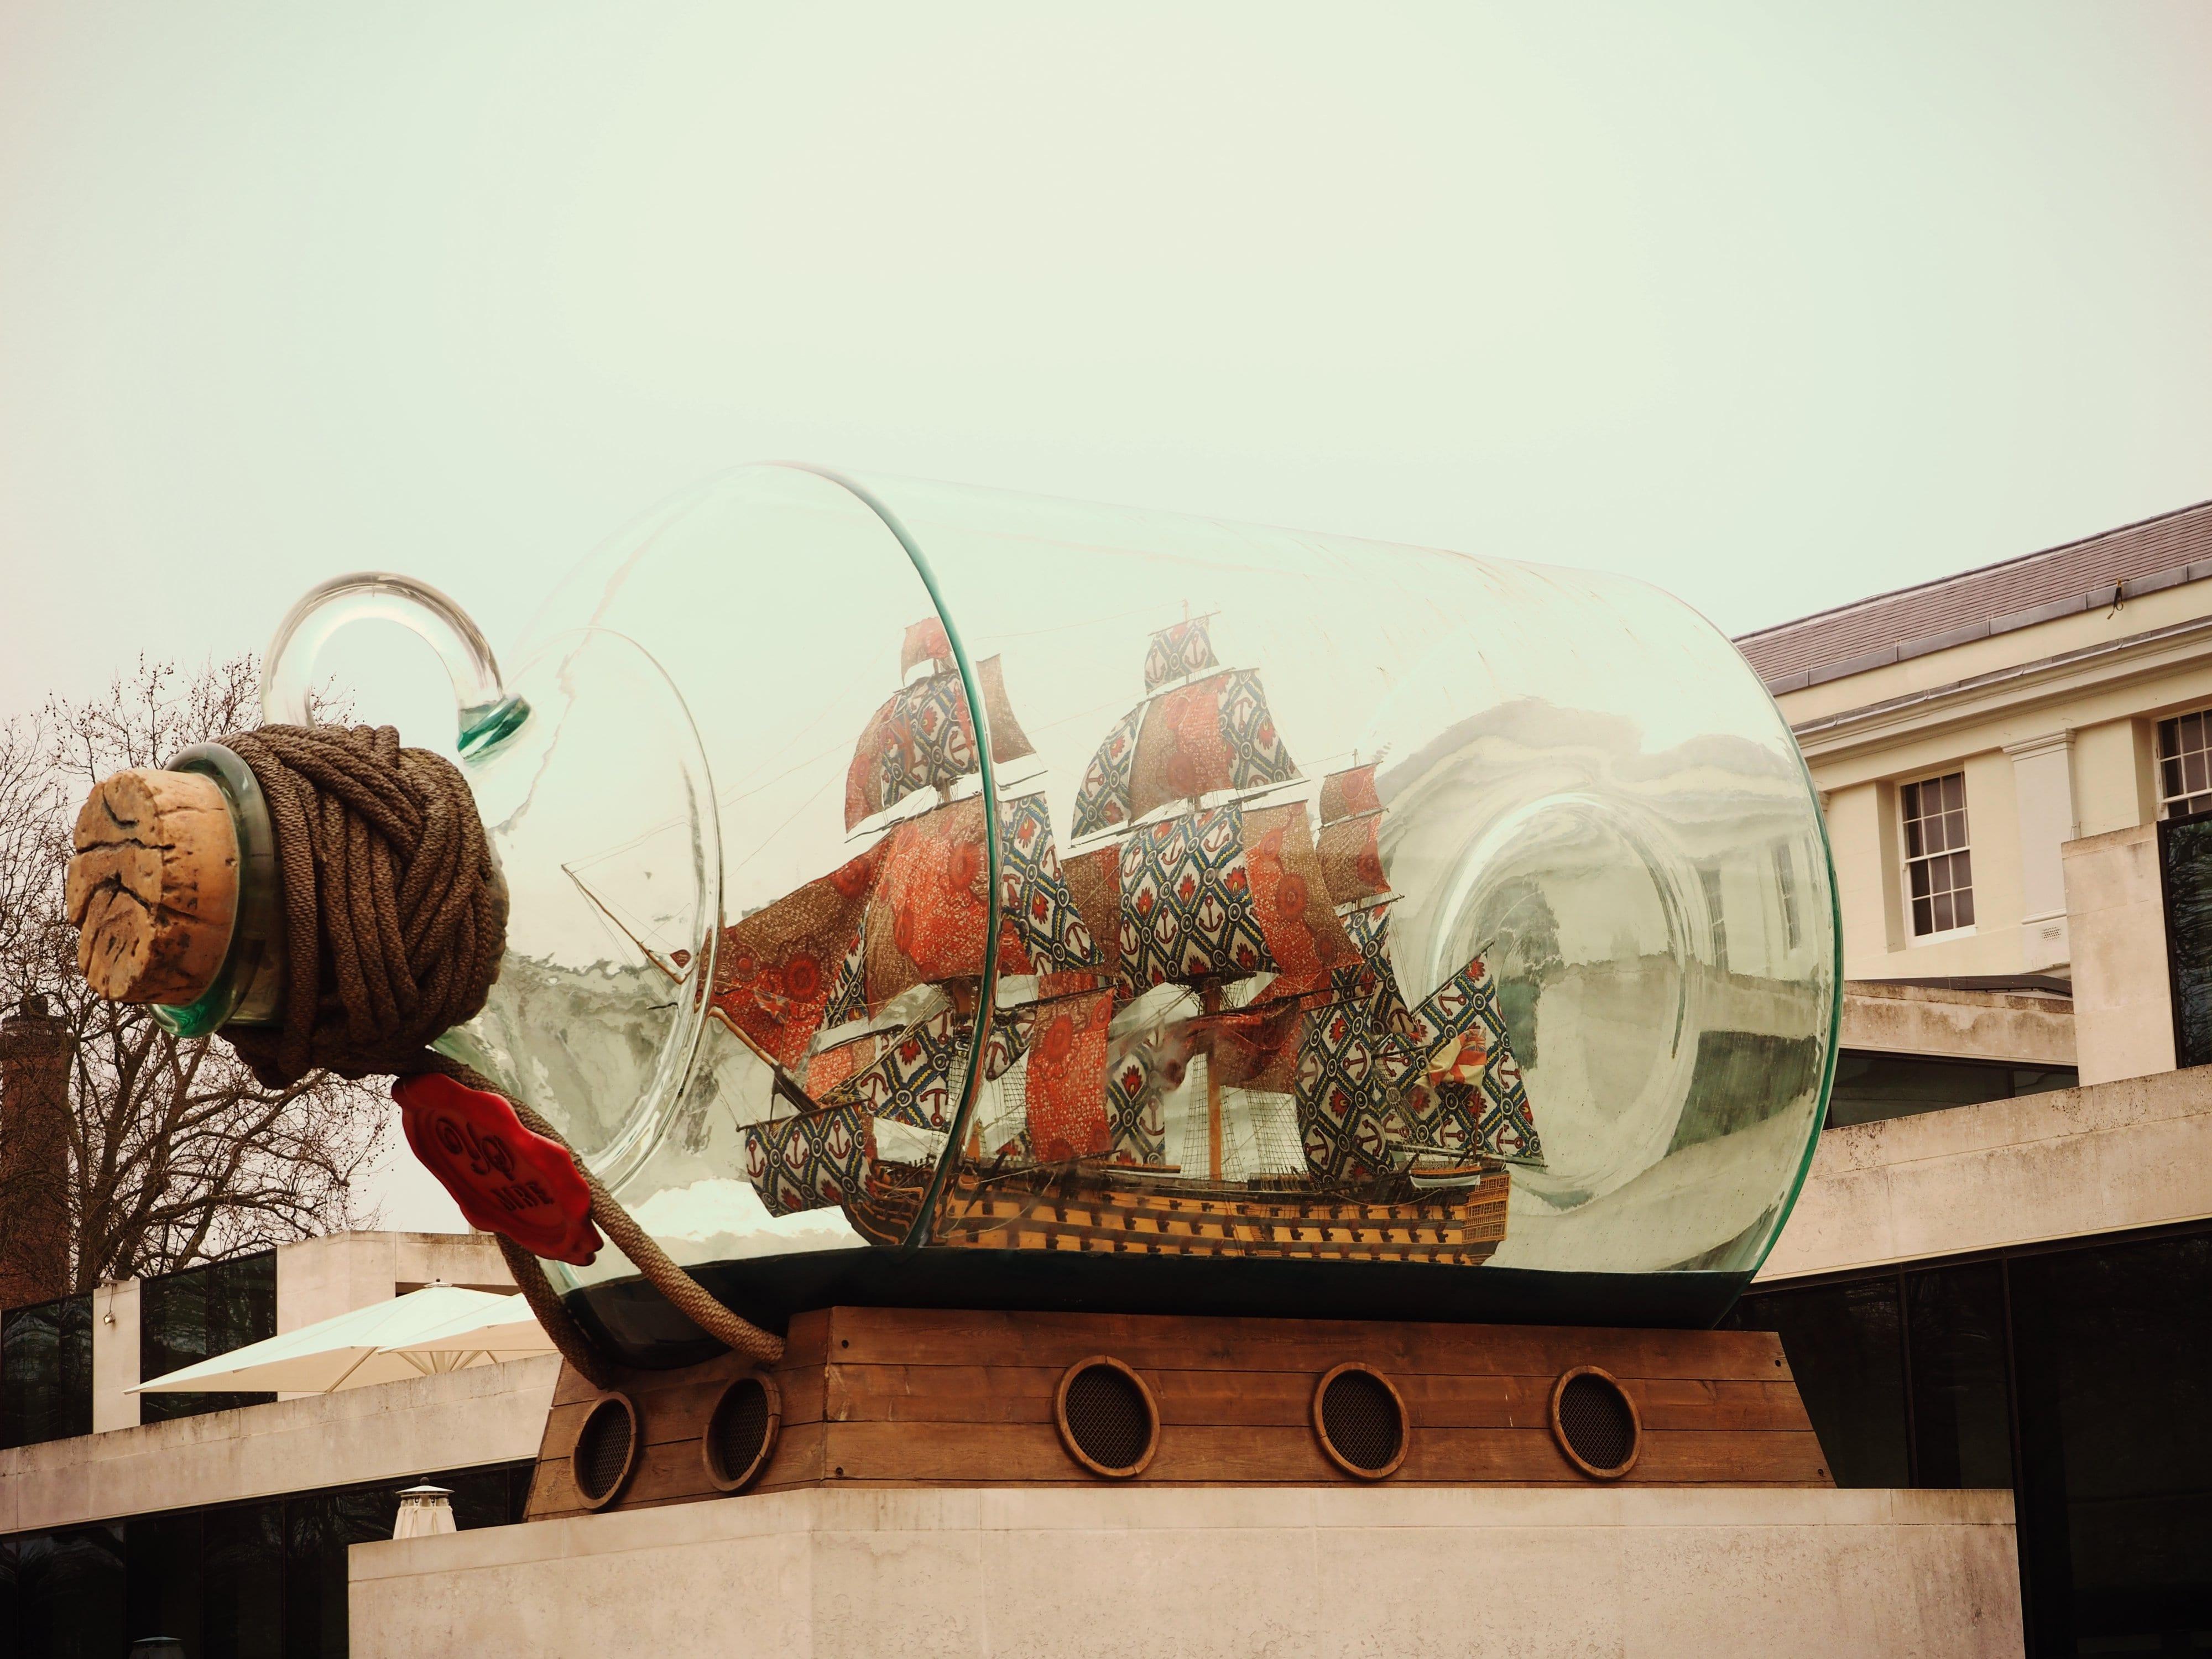 Das berühmte Buddelschiff